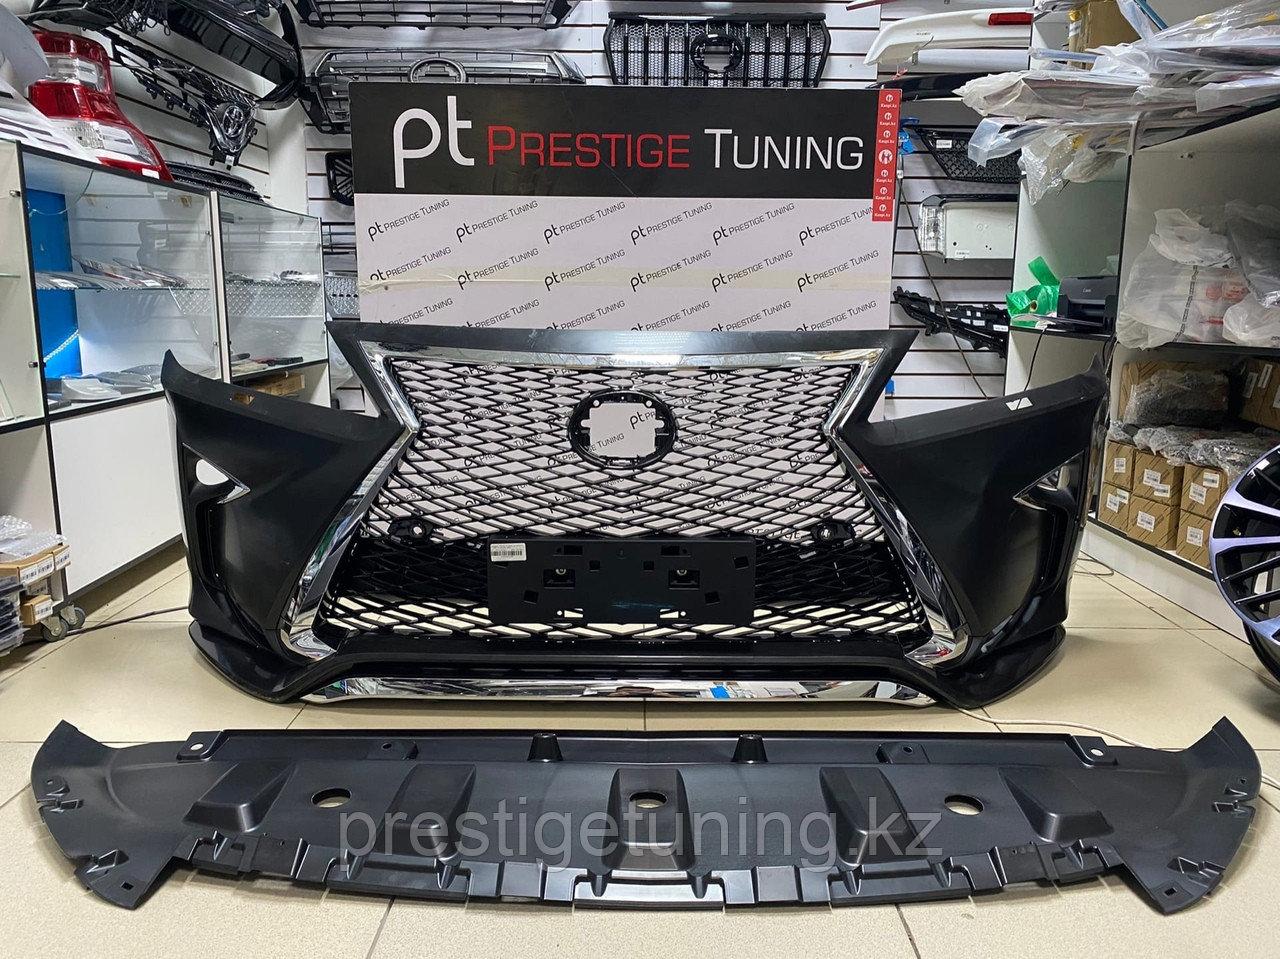 Передний бампер в сборе на Lexus RX 2009-15 дизайн 2016